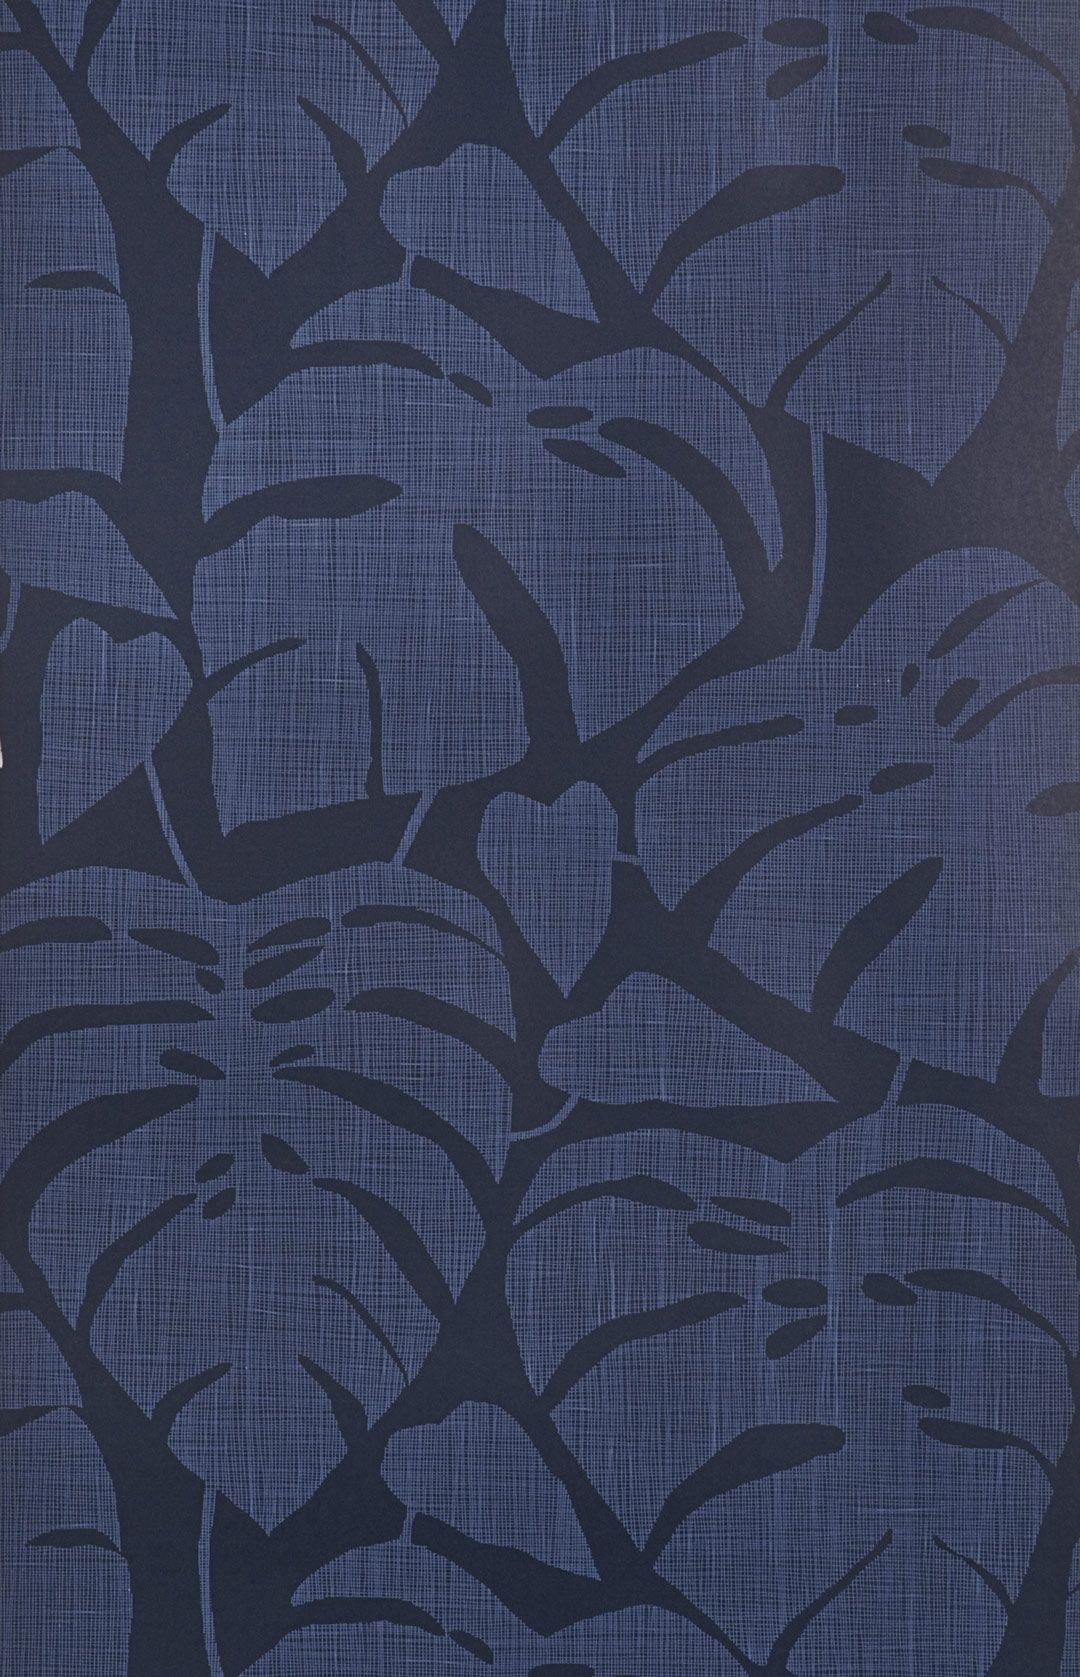 GuatemalaCobalt Navy wallpaper, Royal blue wallpaper